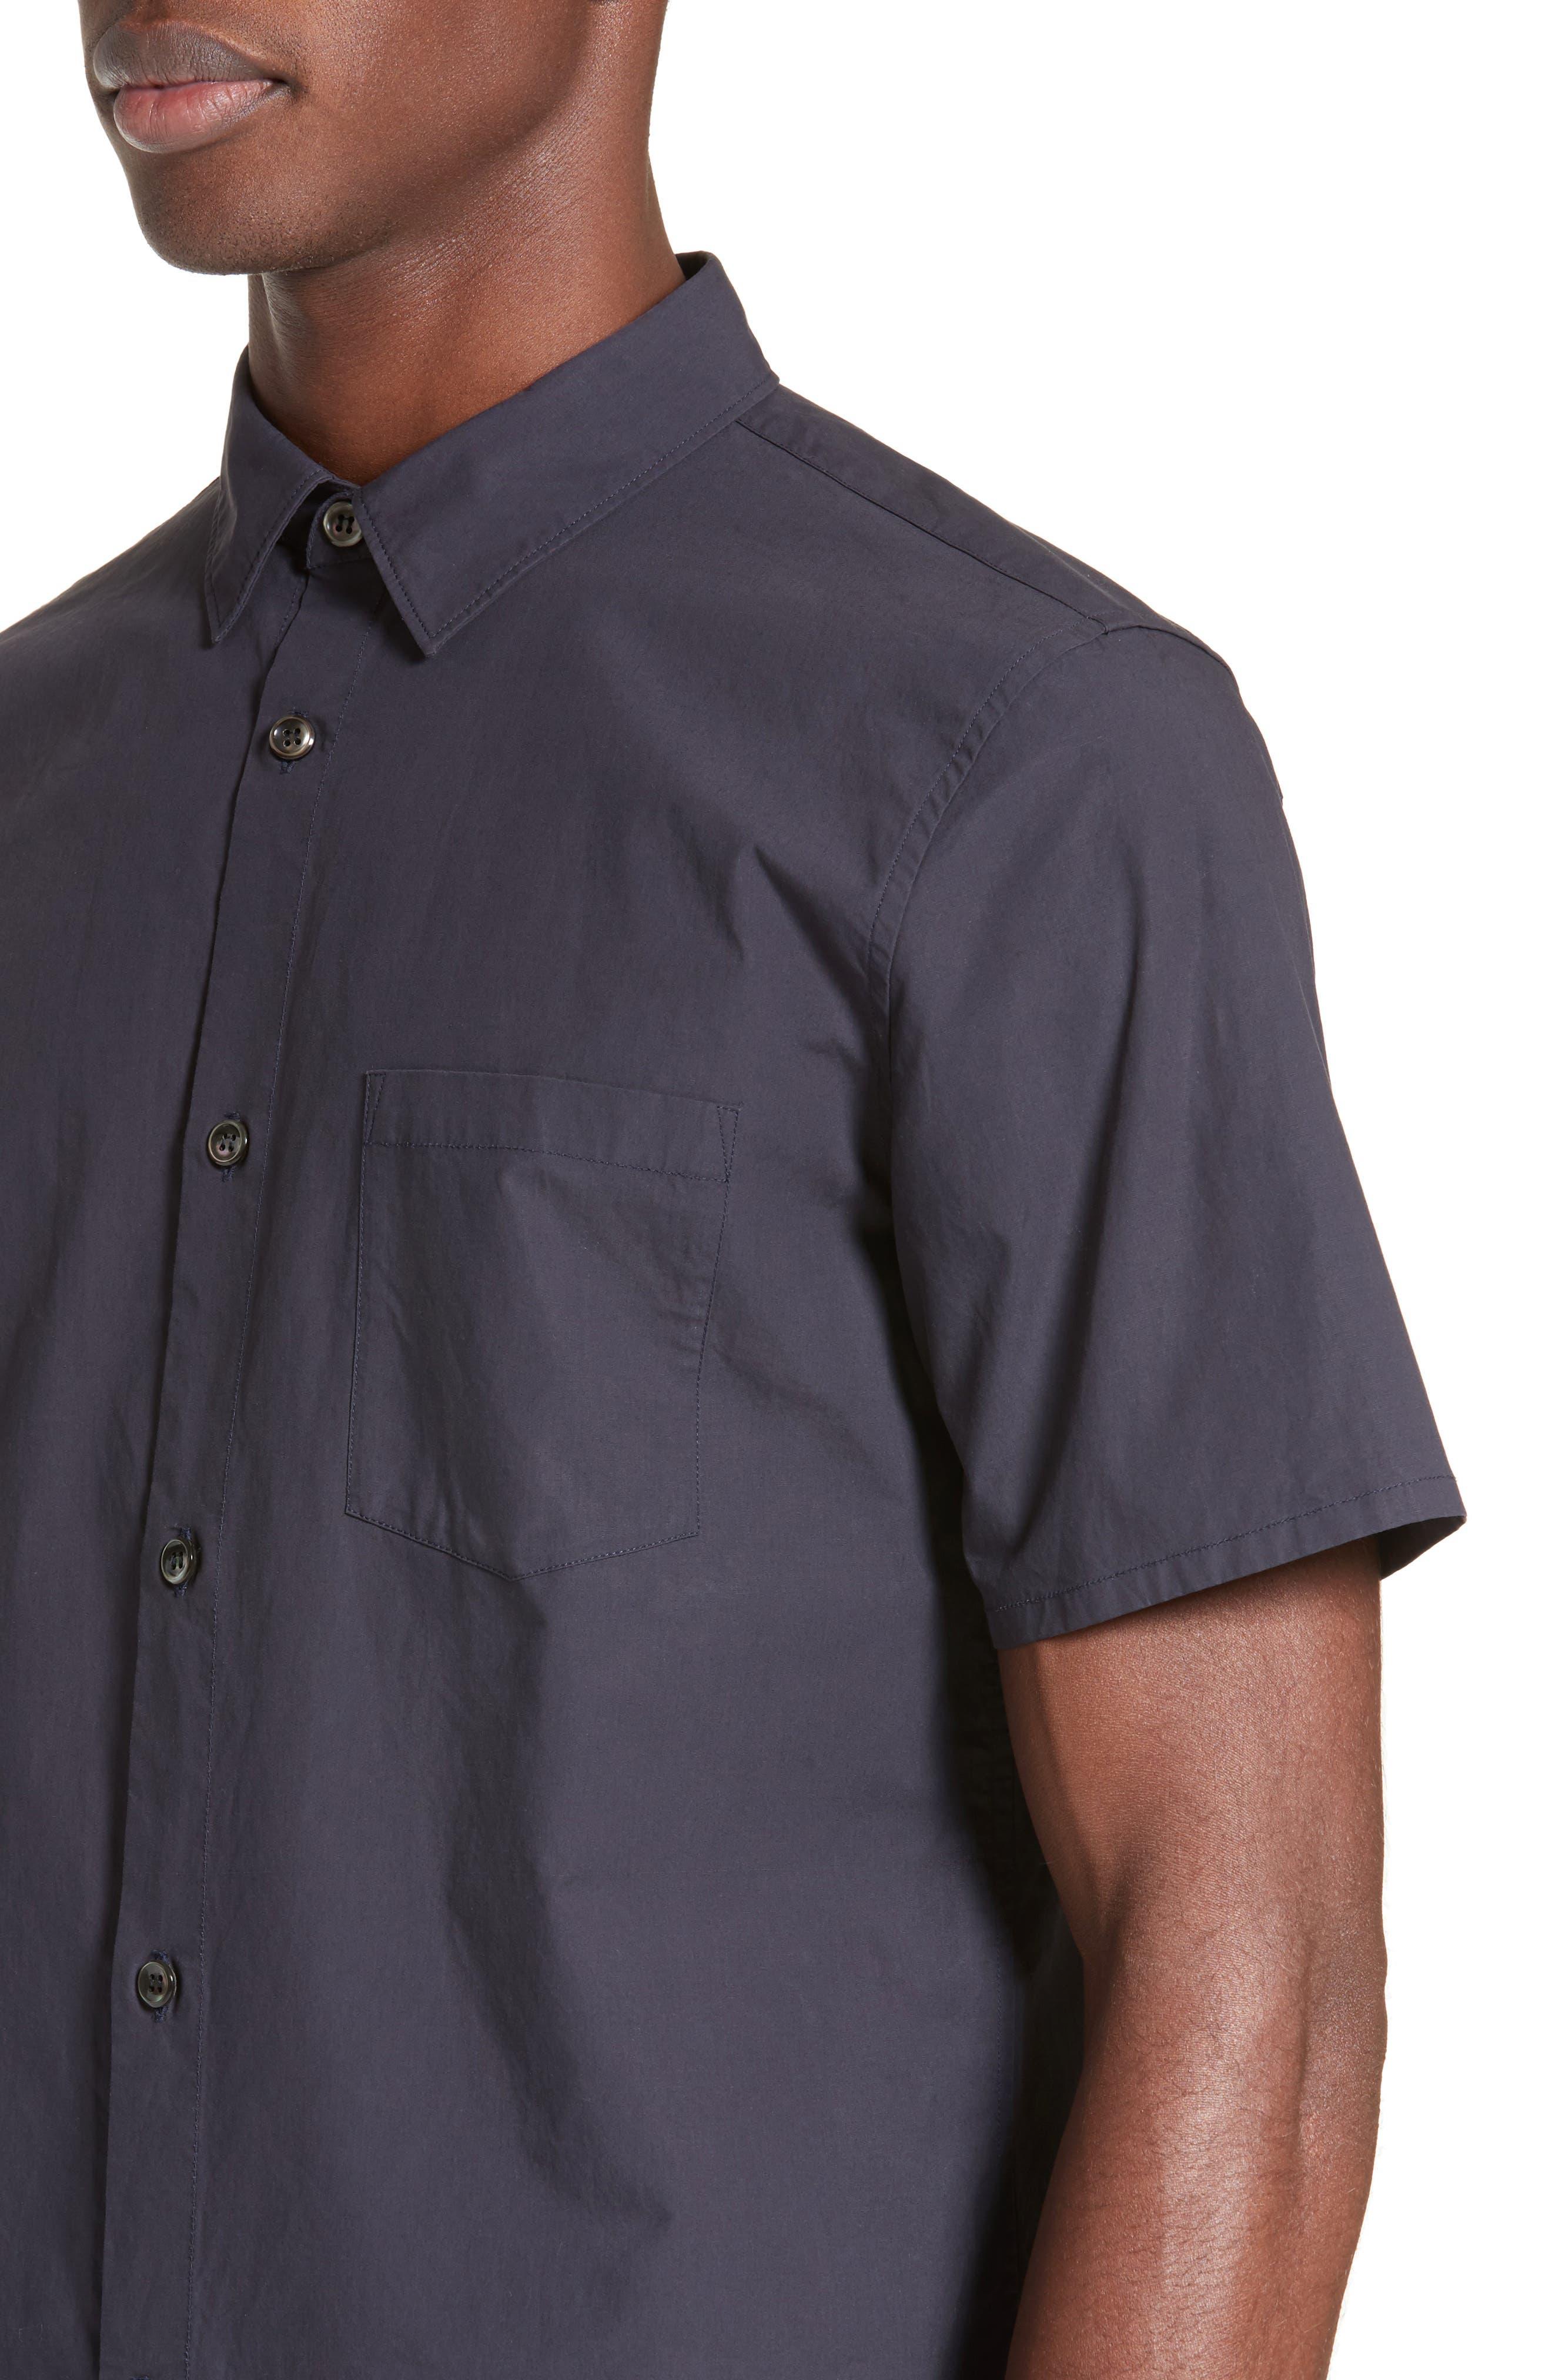 Andreas Extra Trim Fit Sport Shirt,                             Main thumbnail 1, color,                             410